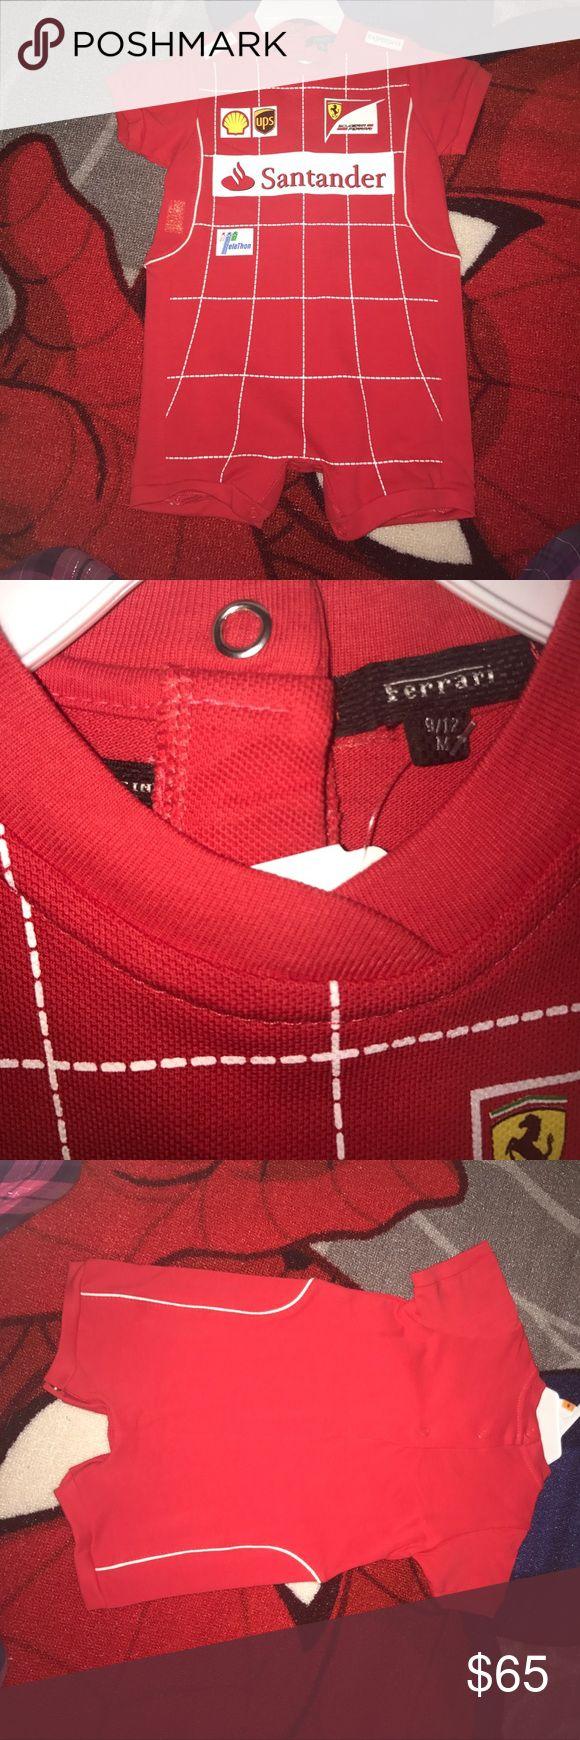 ❤️Baby Boy Ferrari Romper 9-12M❤️ Brand new baby boy ferrari romper 9-12M. Feel free to ask any questions or make an offer! Ferrari One Pieces